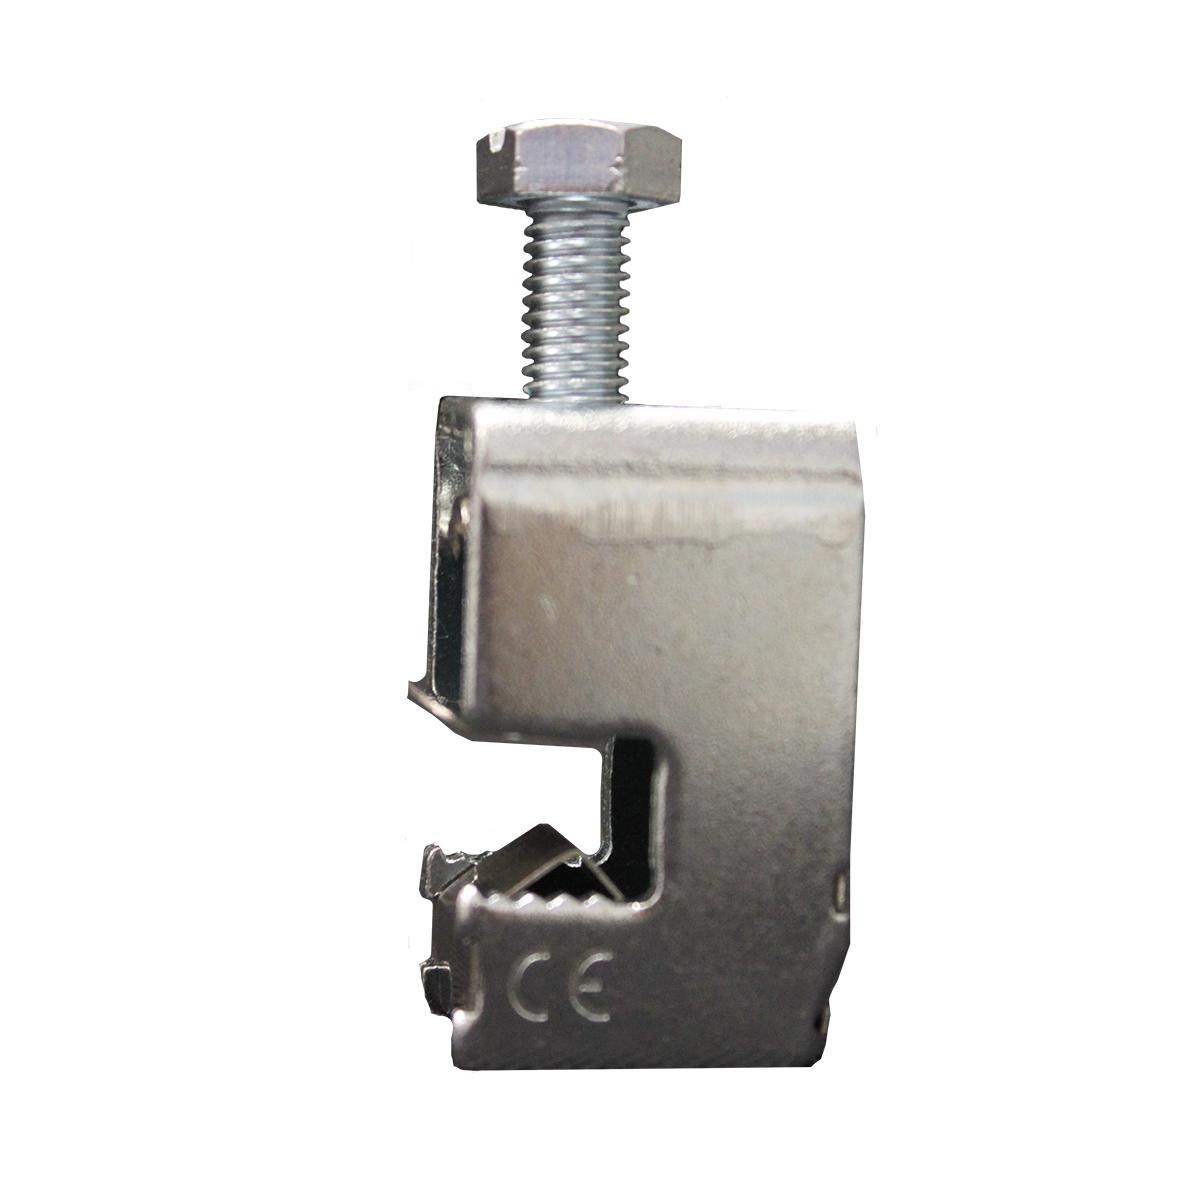 1 Stk Alu-Kupfer-Leiteranschlußklemme 50 -185mm² / 10mm² IS5051810-